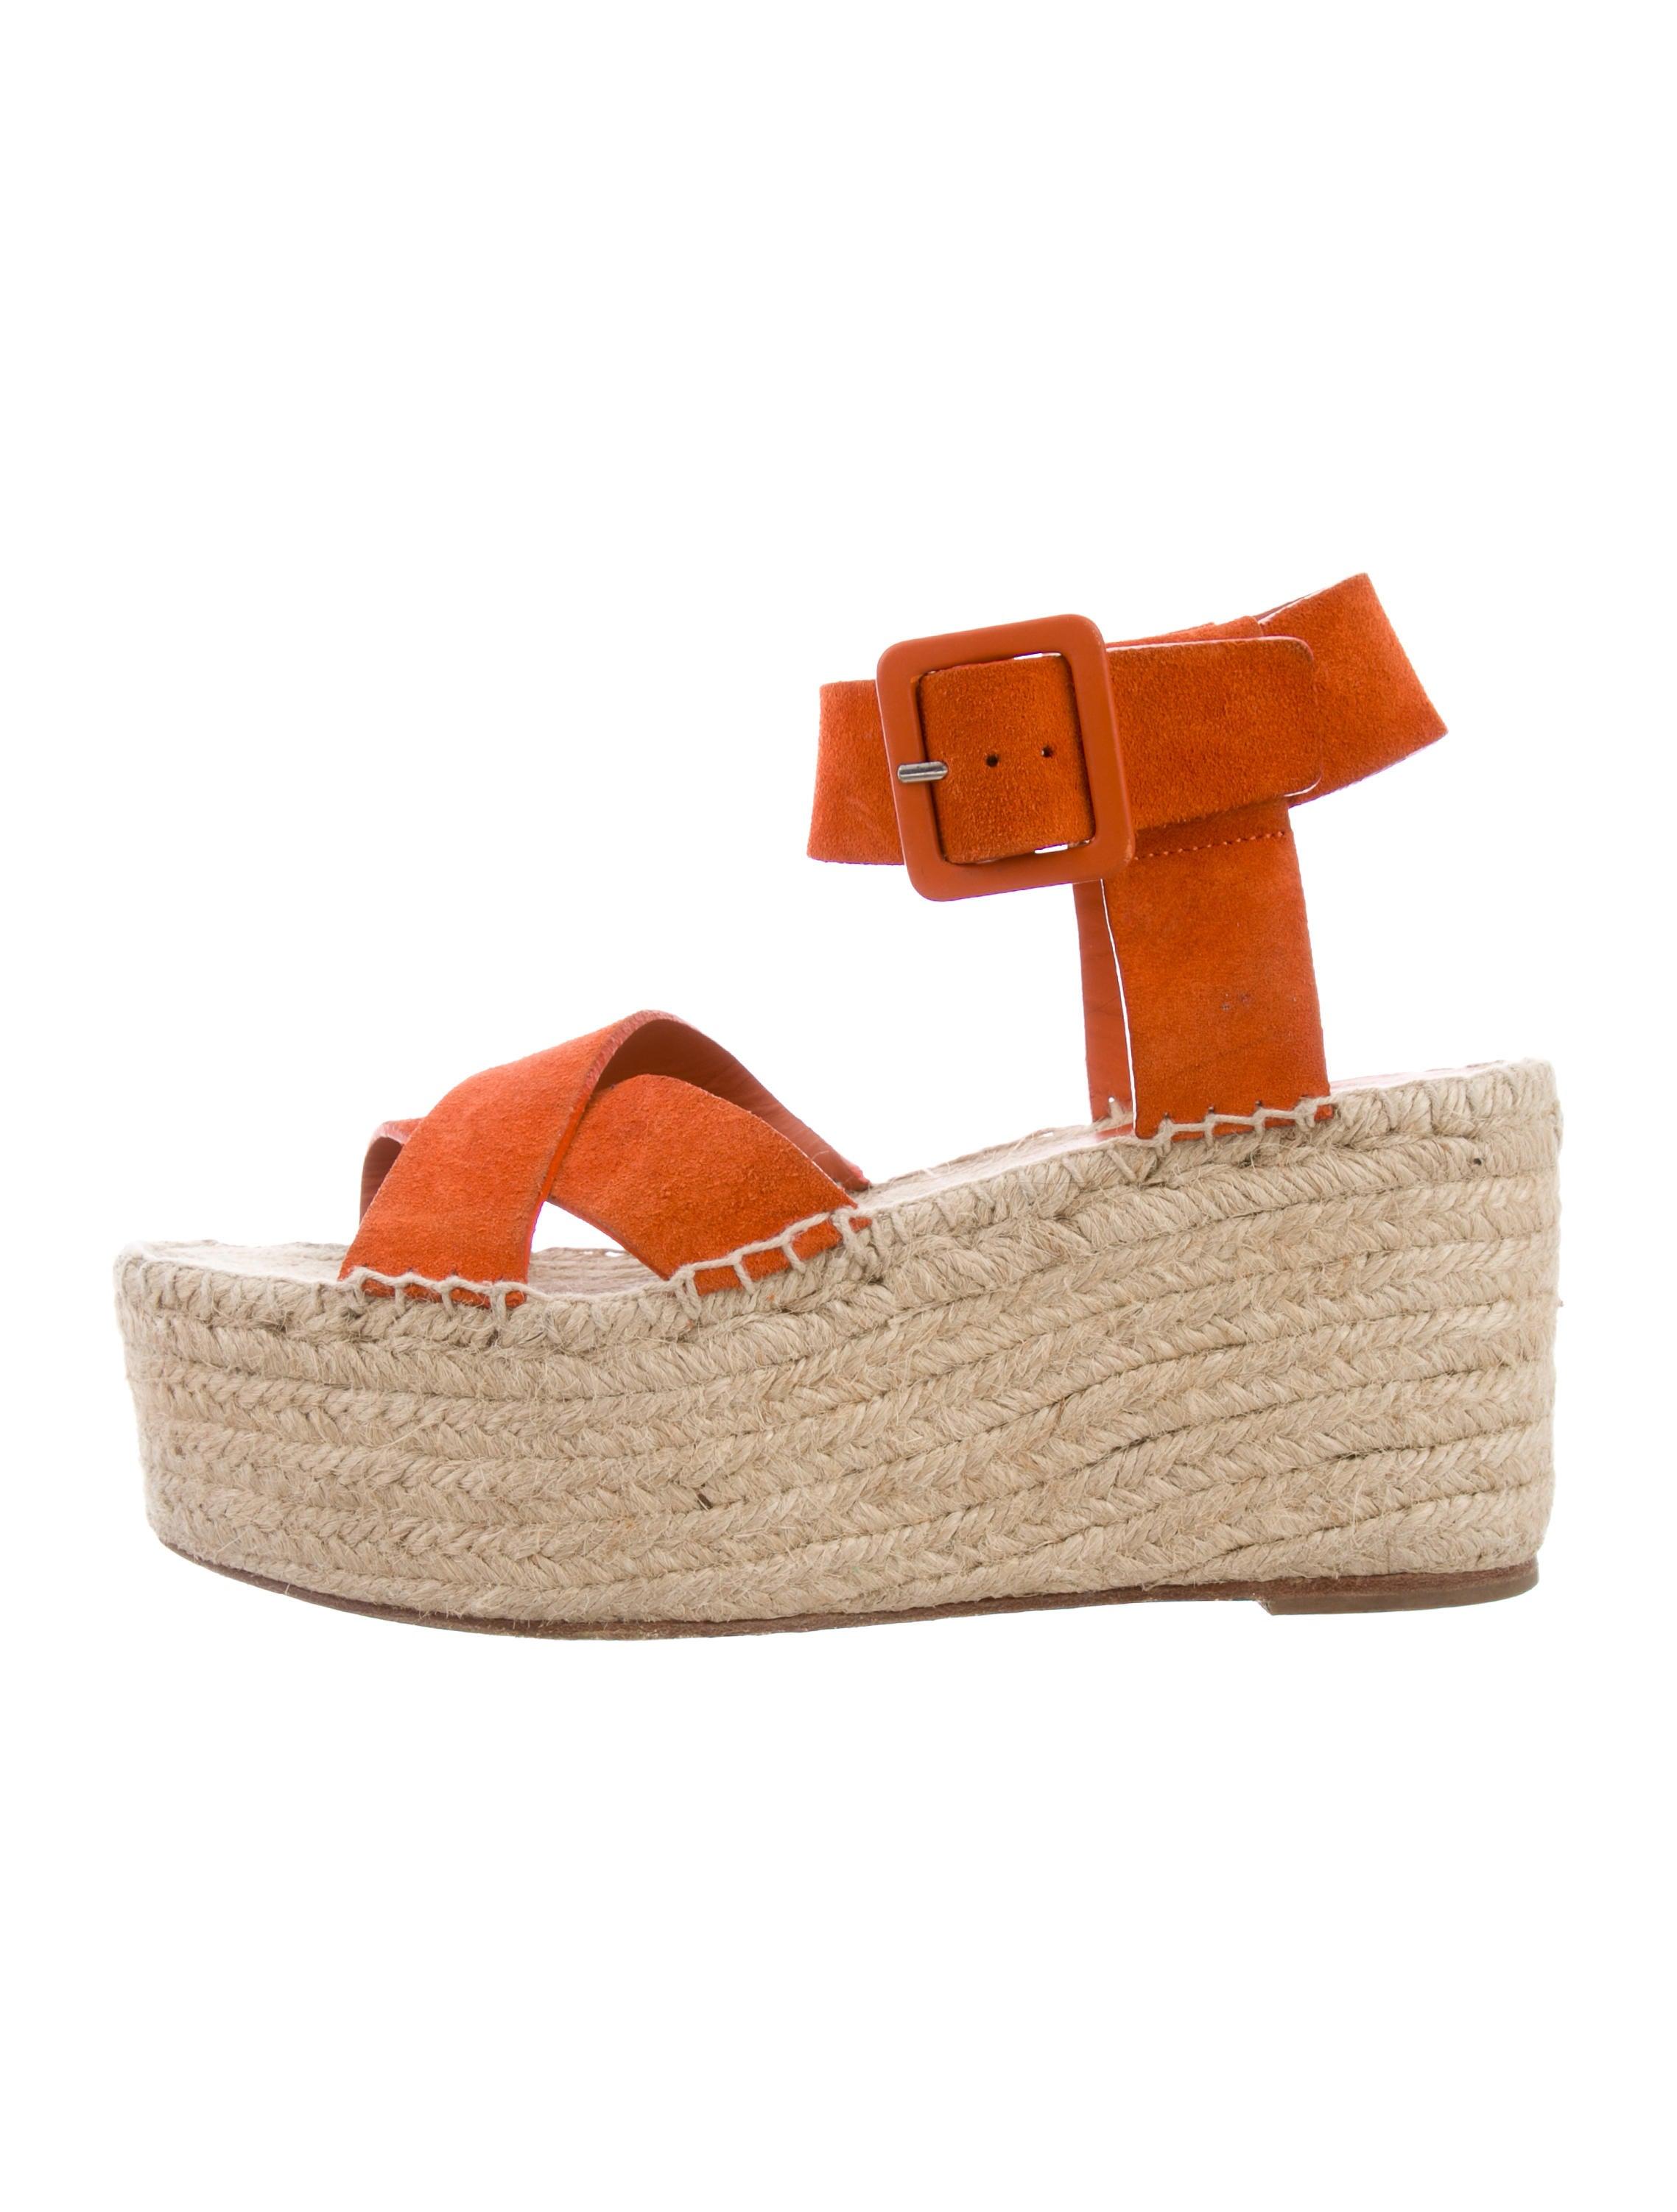 Orange 100% Original Céline Ankle Strap Espadrille Wedges view cheap price sale best prices 49eD0QB